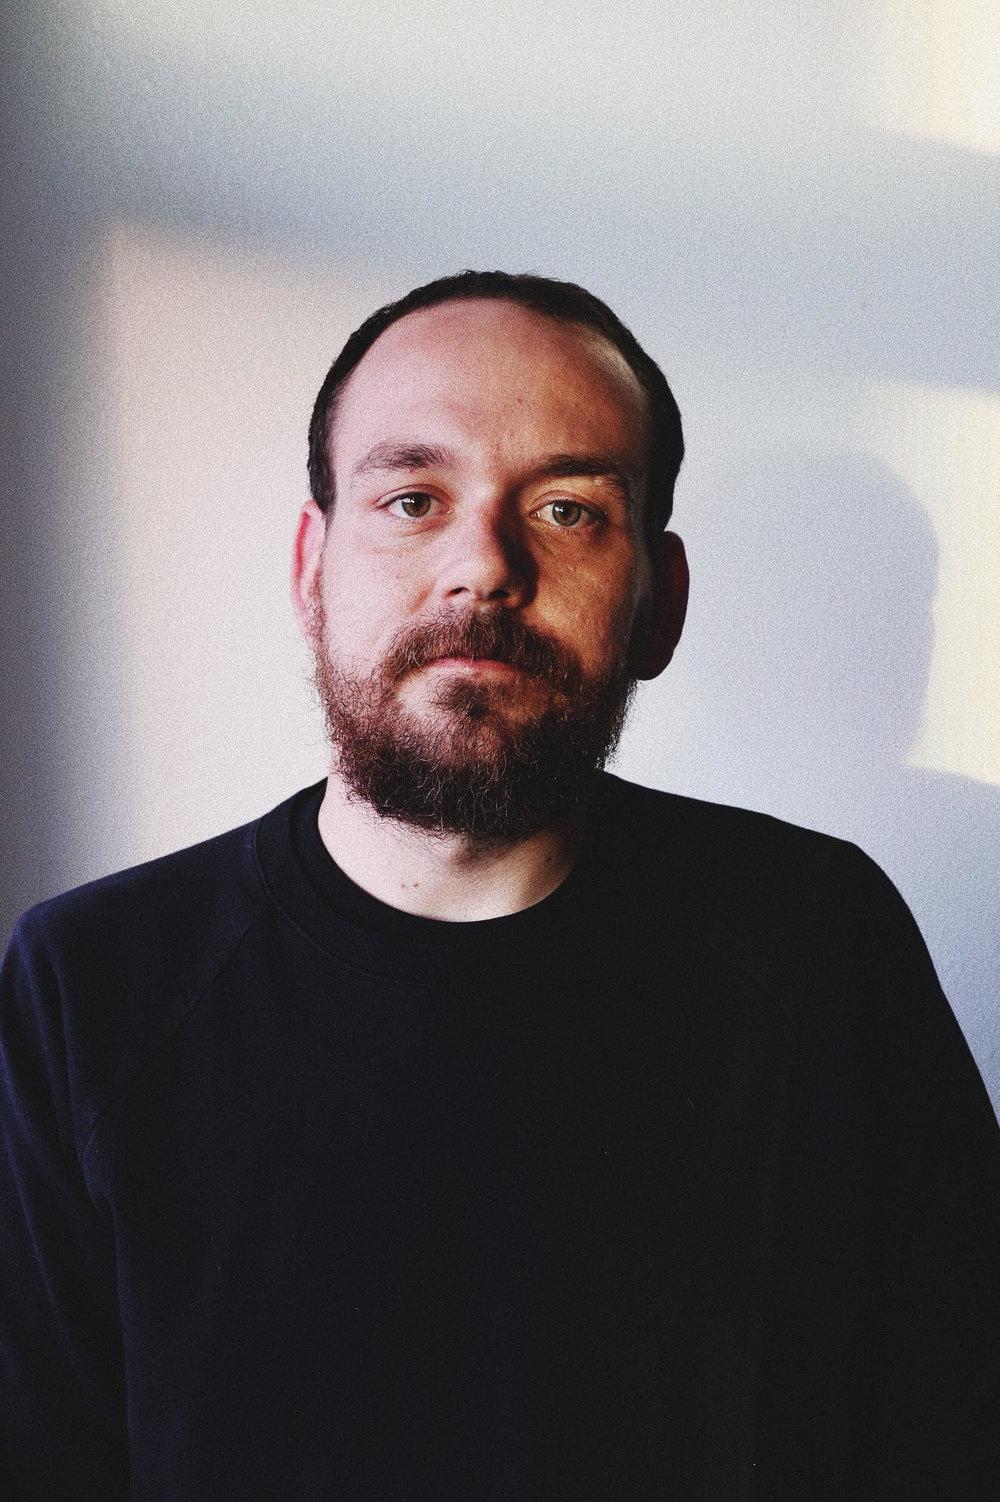 Joshua LaBure